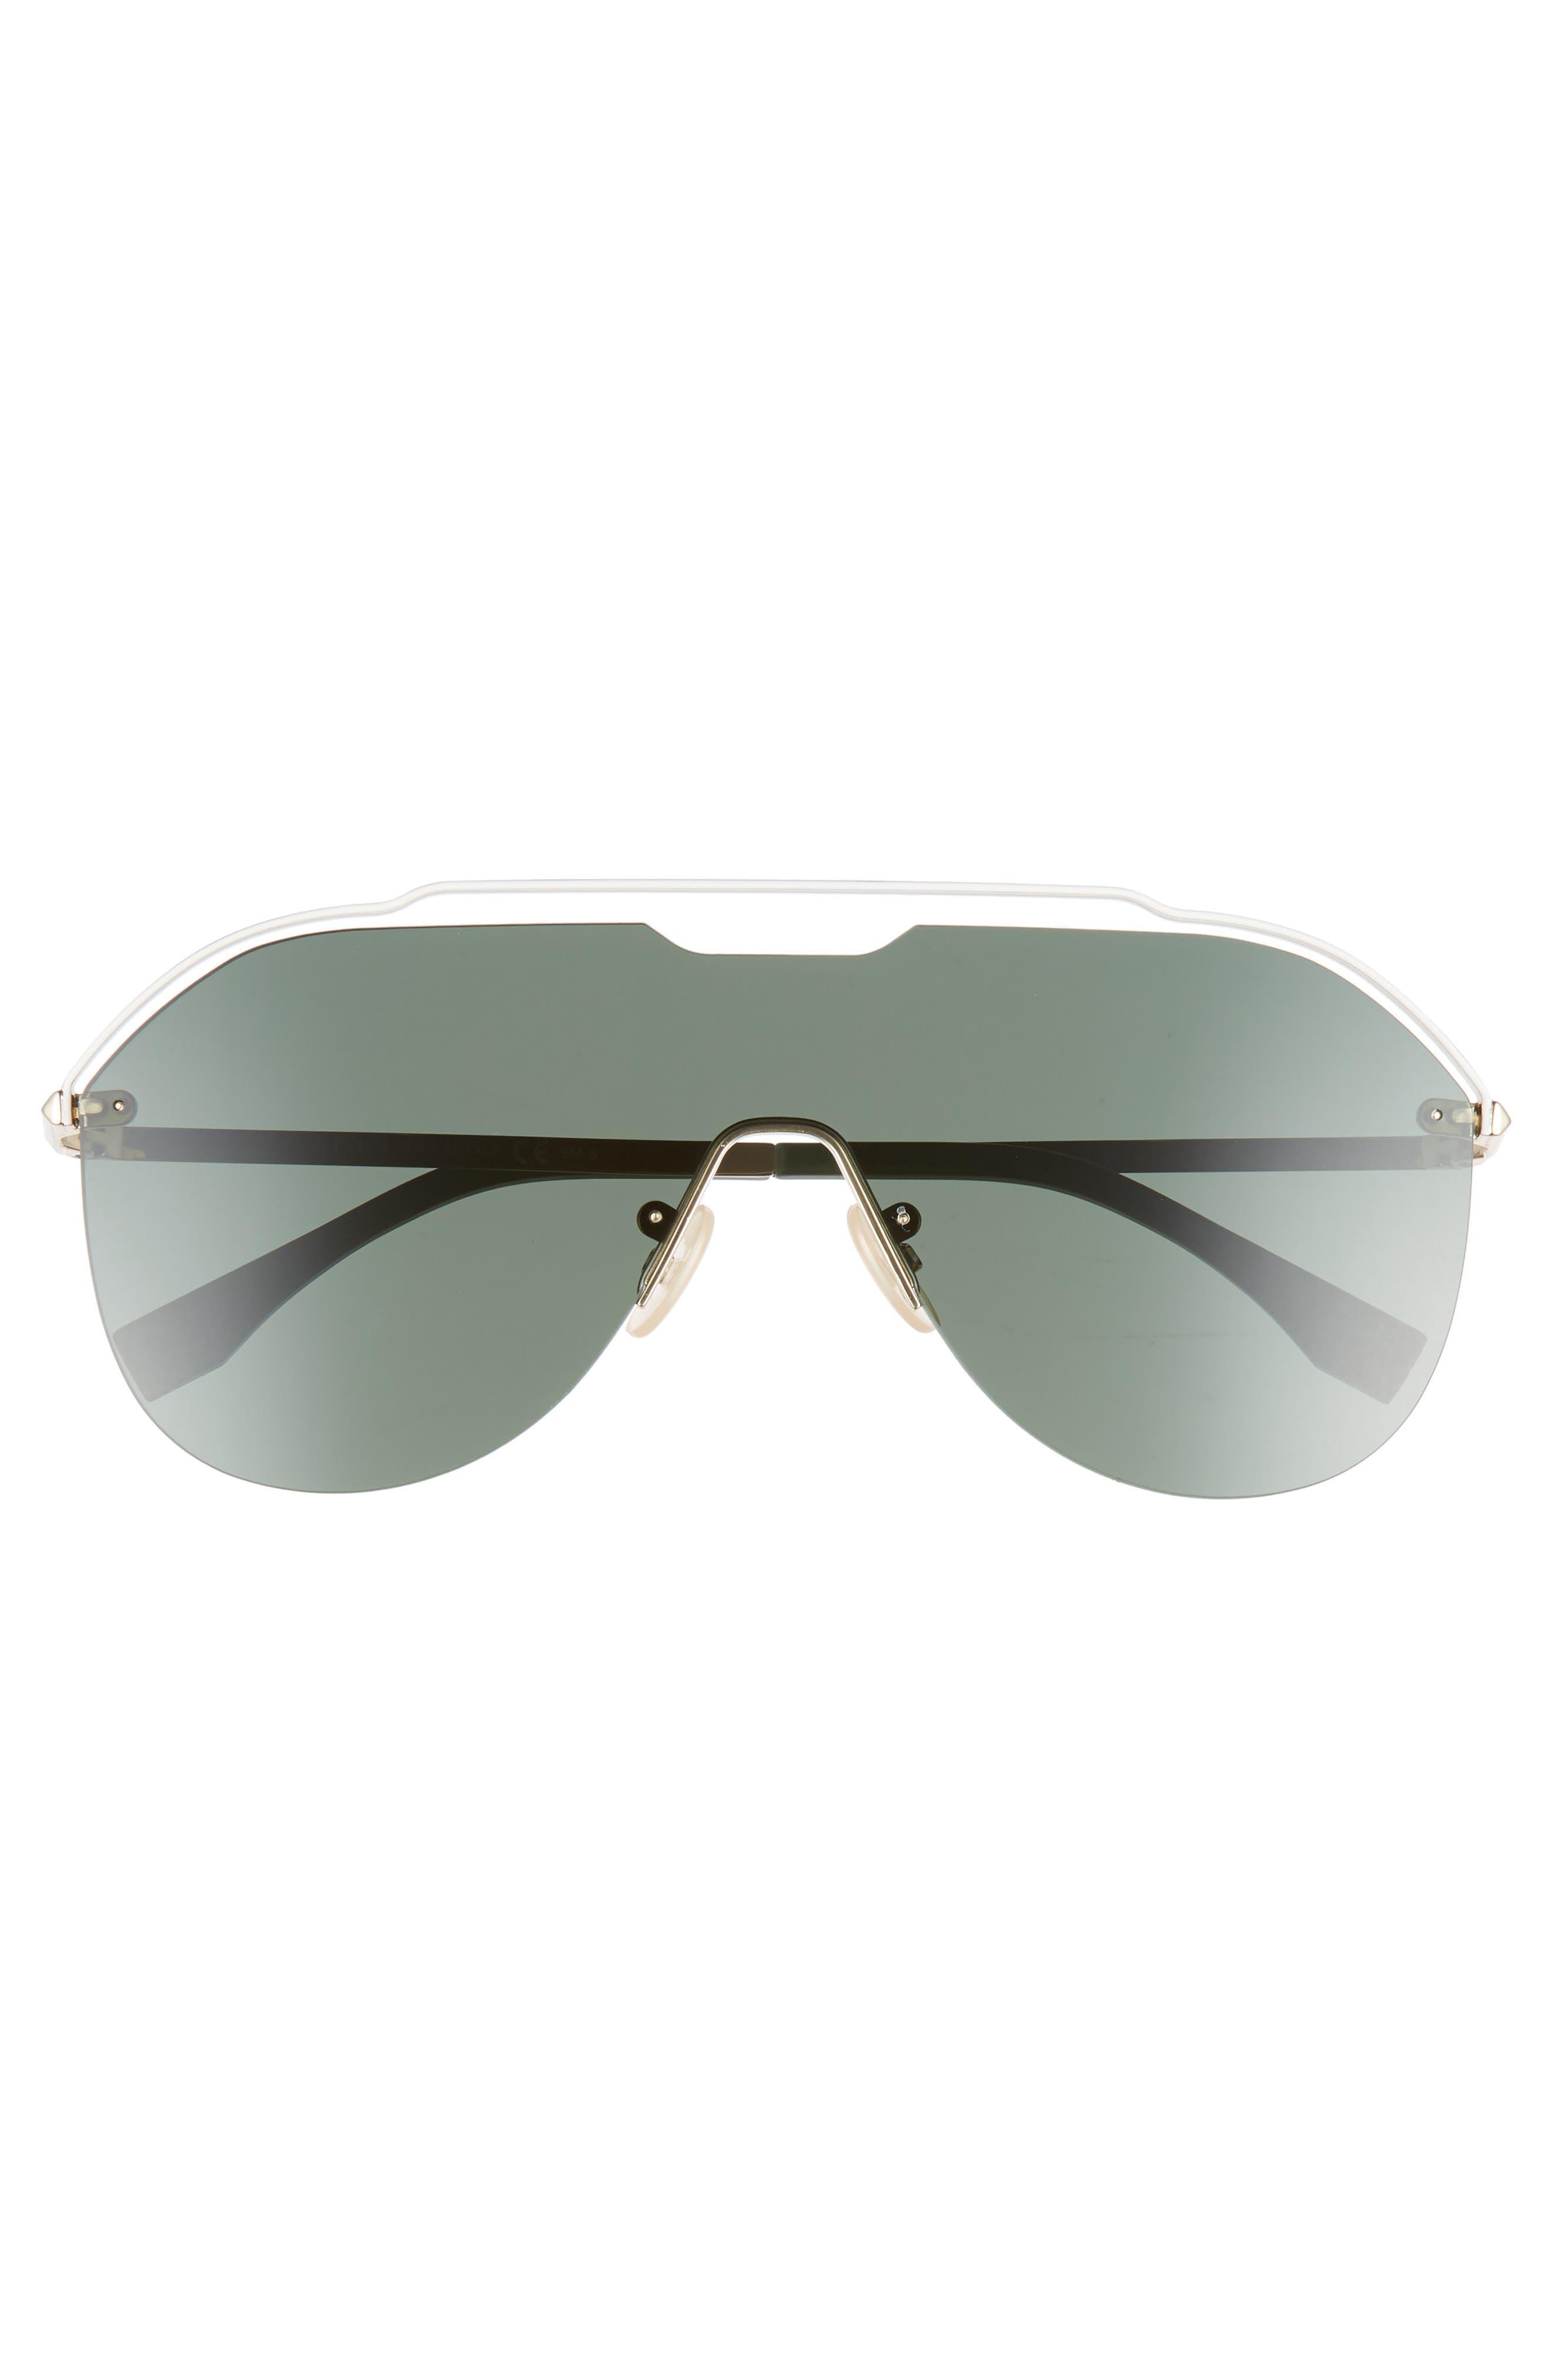 137mm Shield Aviator Sunglasses,                             Alternate thumbnail 2, color,                             GOLD